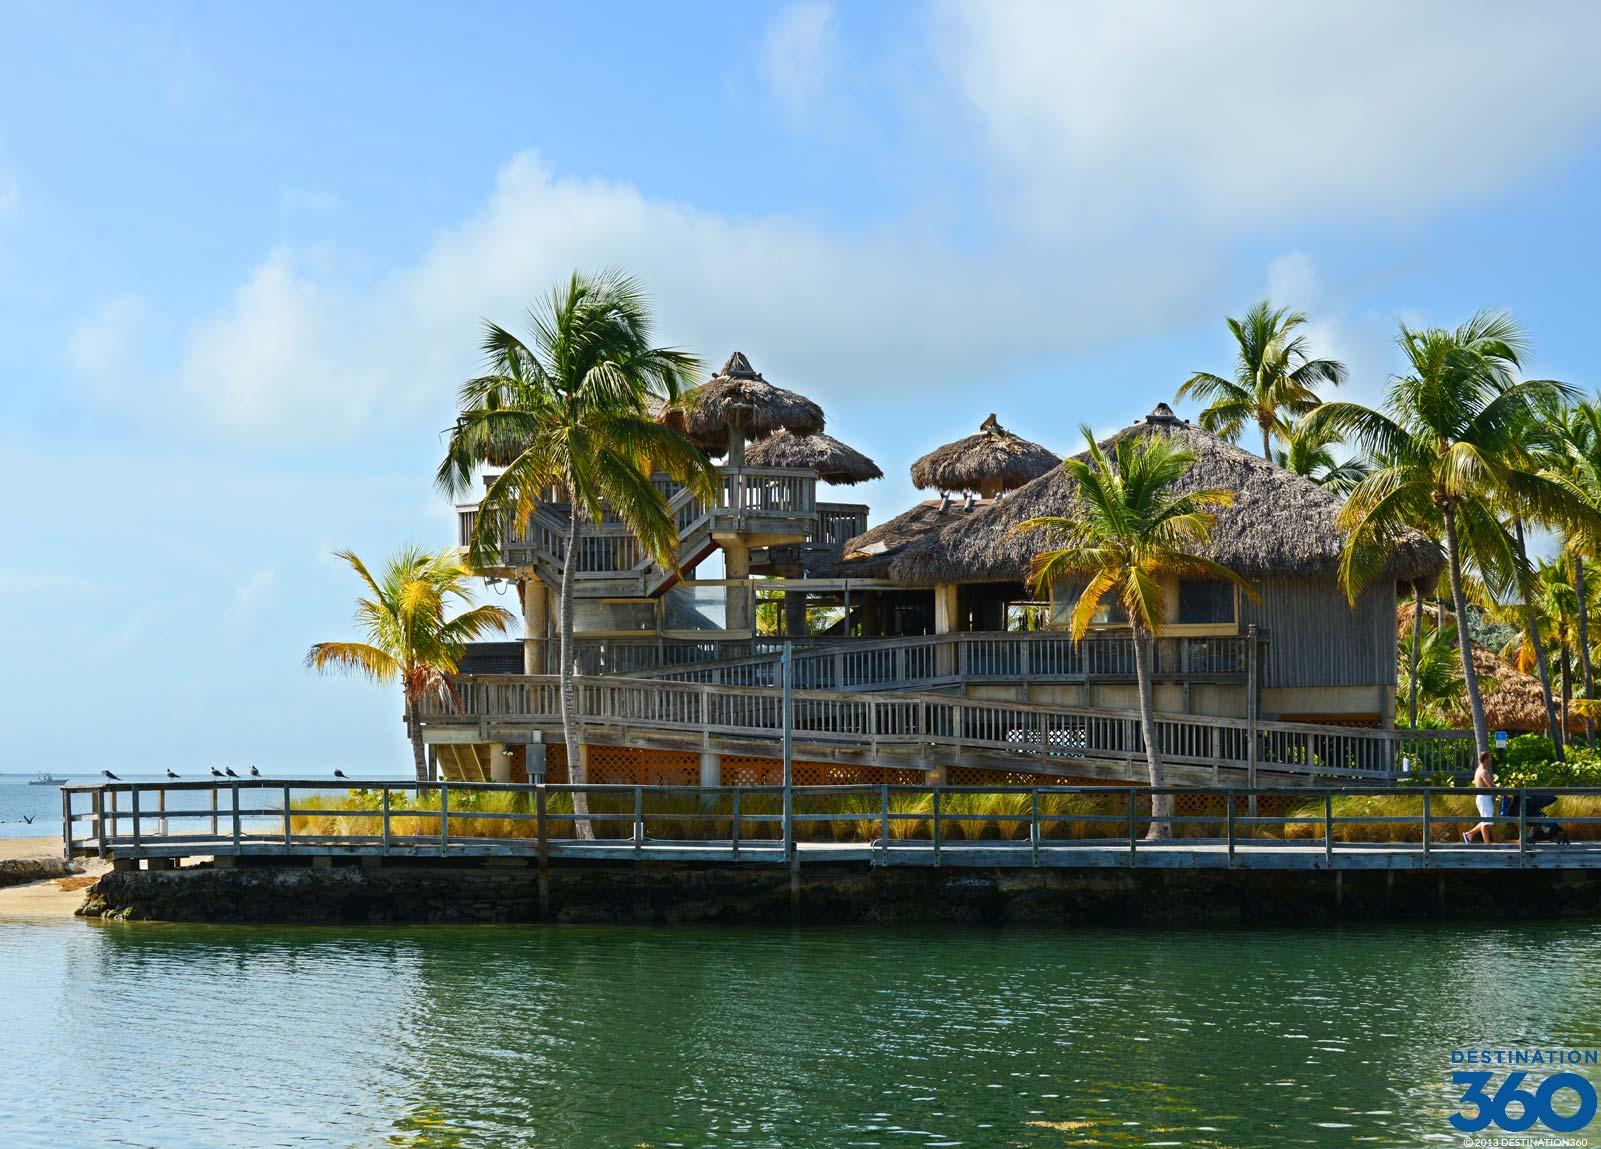 Best Kitchen Gallery: Islamorada Hotels Islamorada Resorts of Florida Keys Hotels And Resorts  on rachelxblog.com